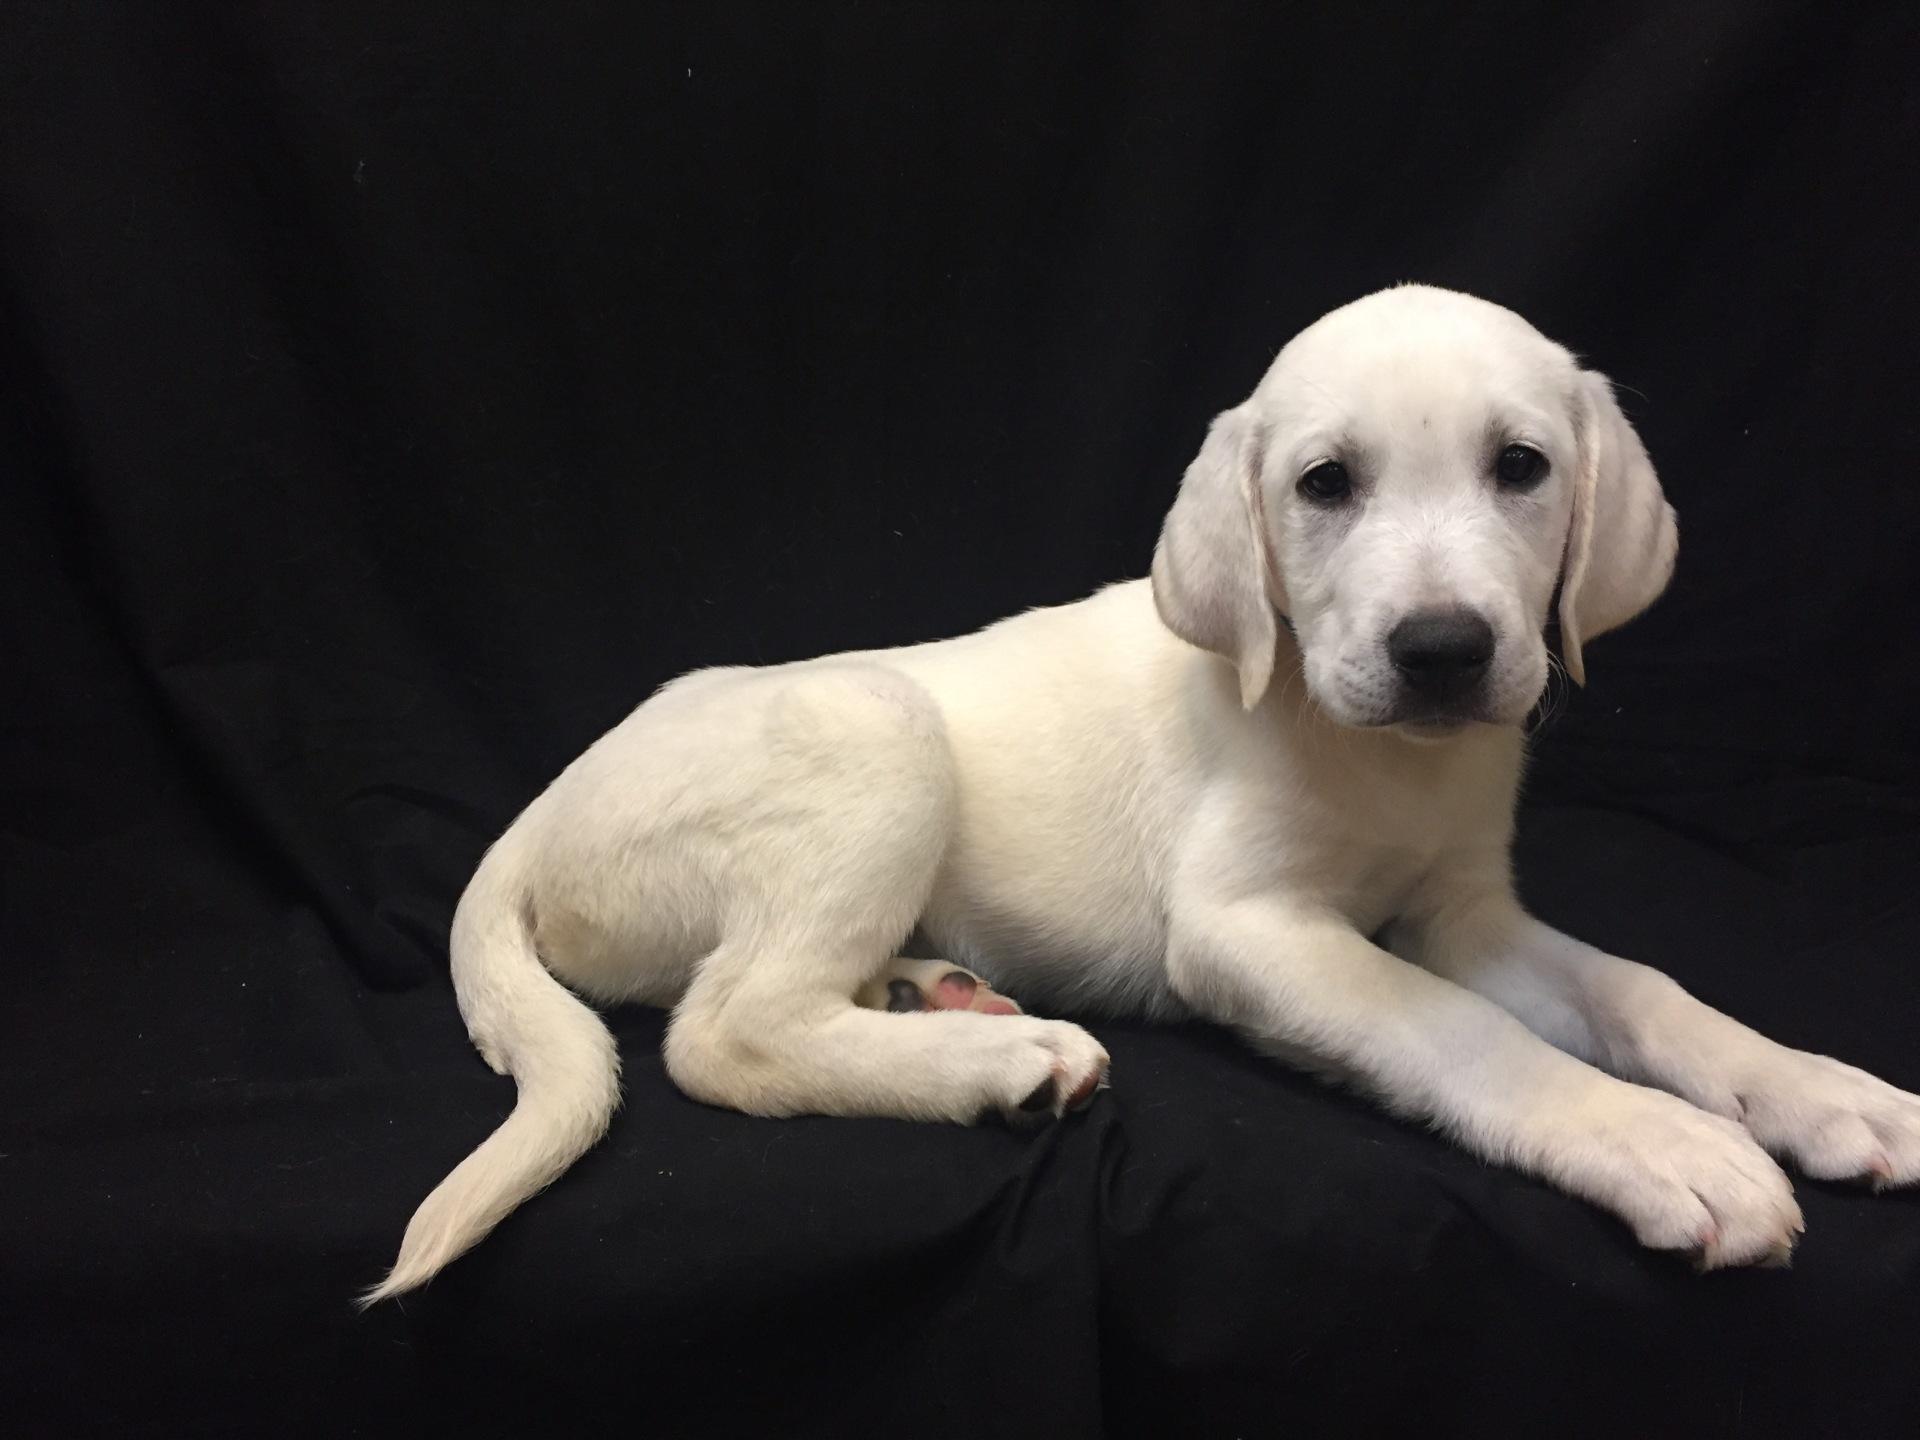 #2821 - Male Labrador